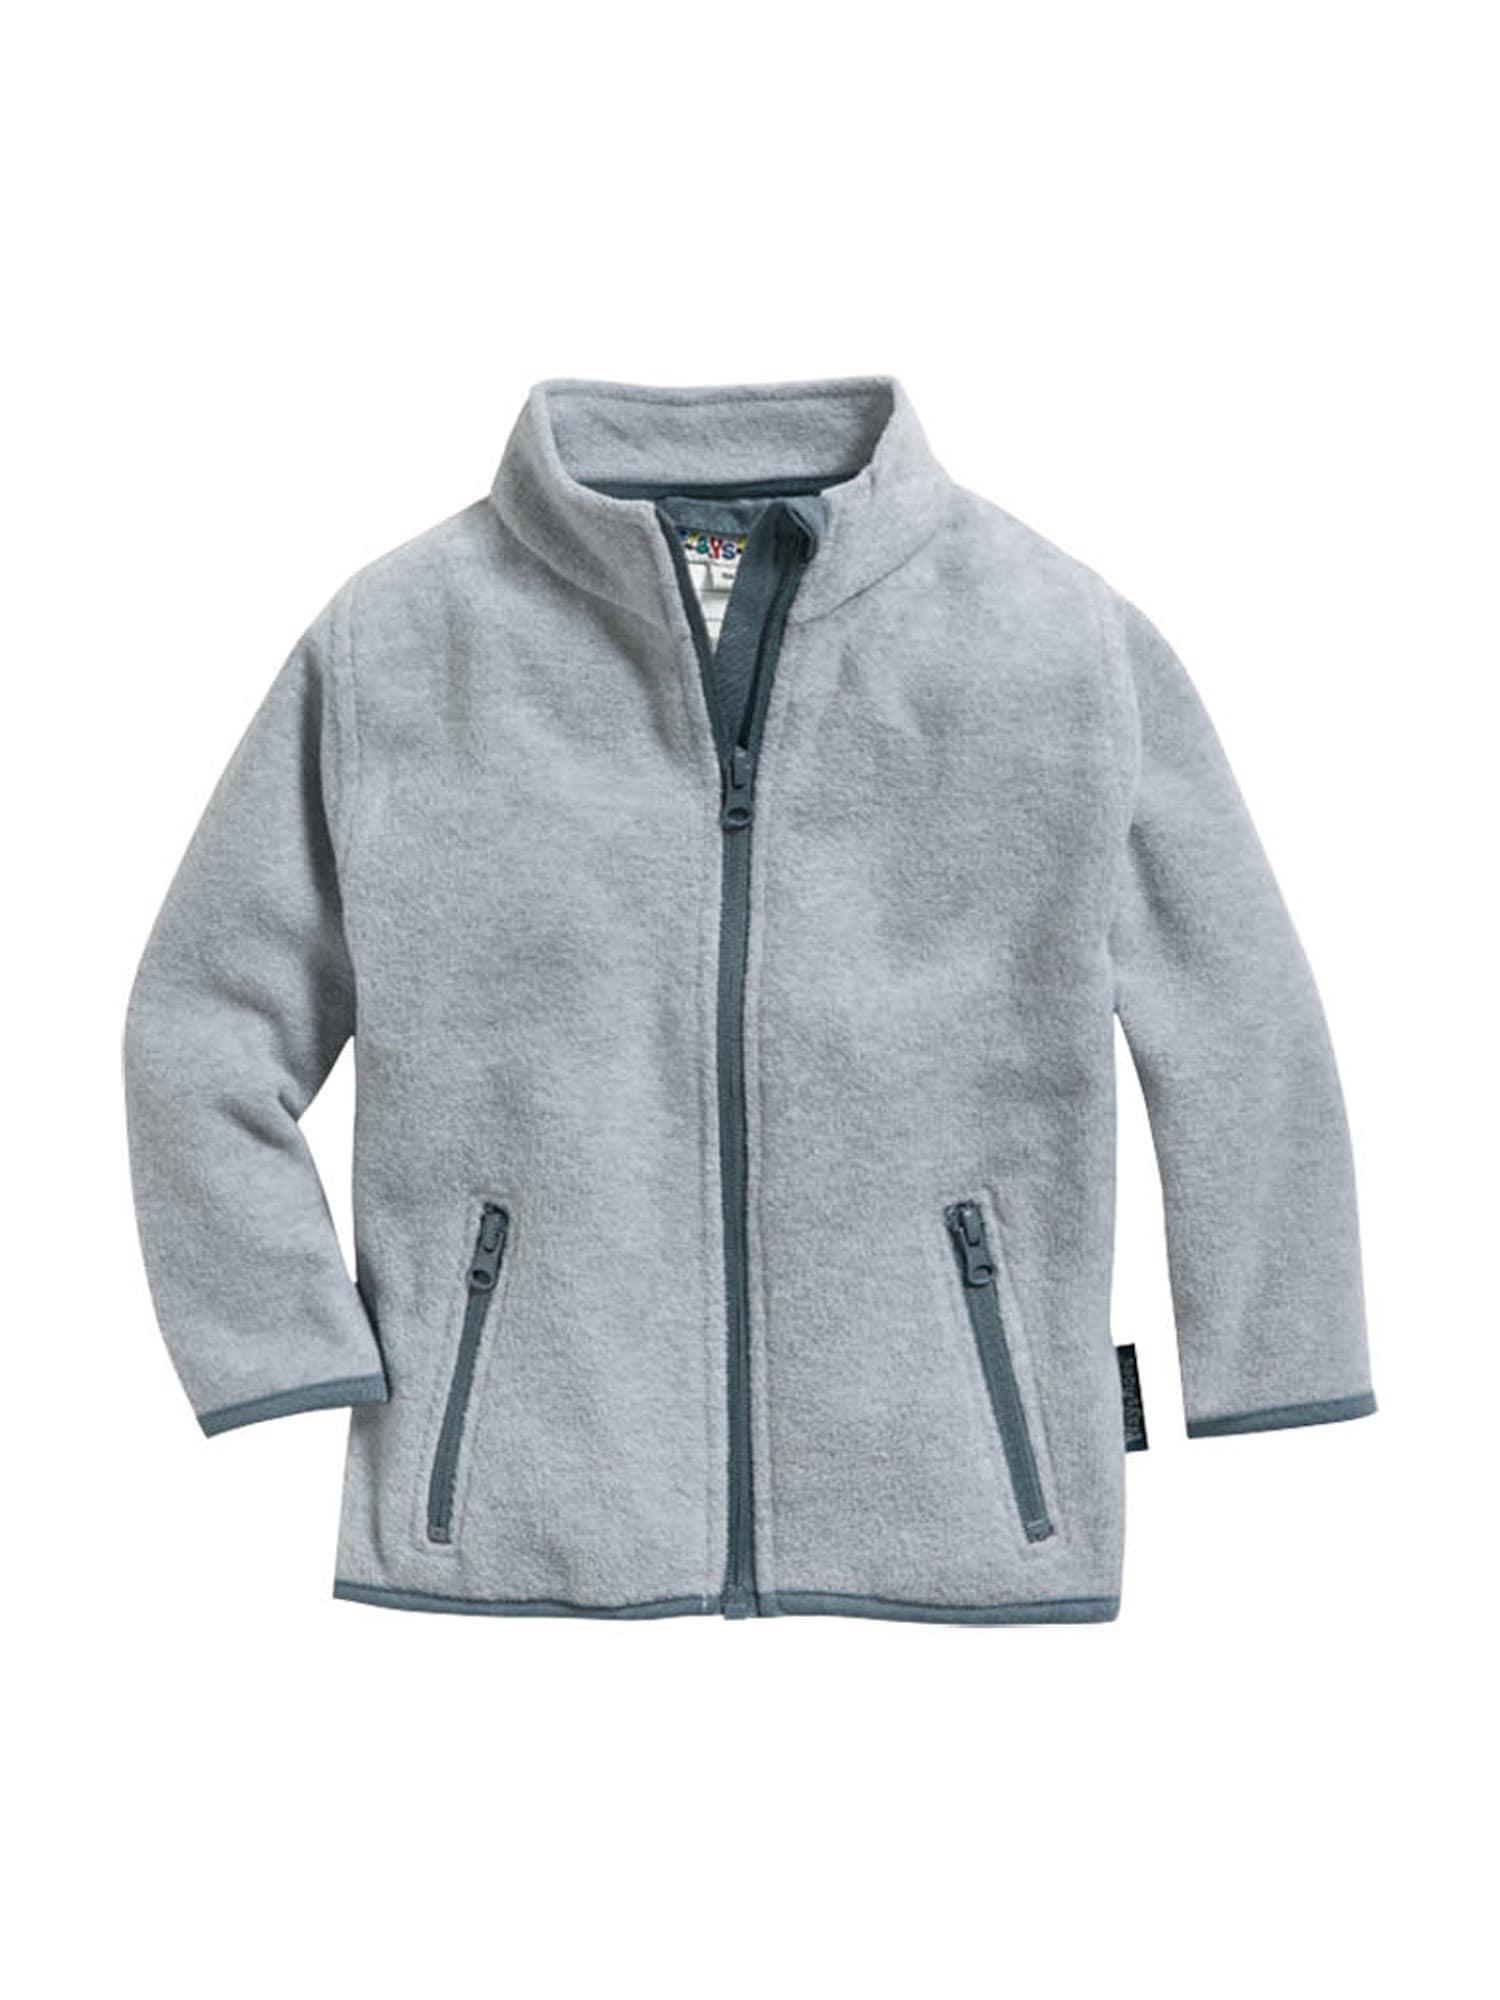 PLAYSHOES Flisinis džemperis pilka / bazalto pilka